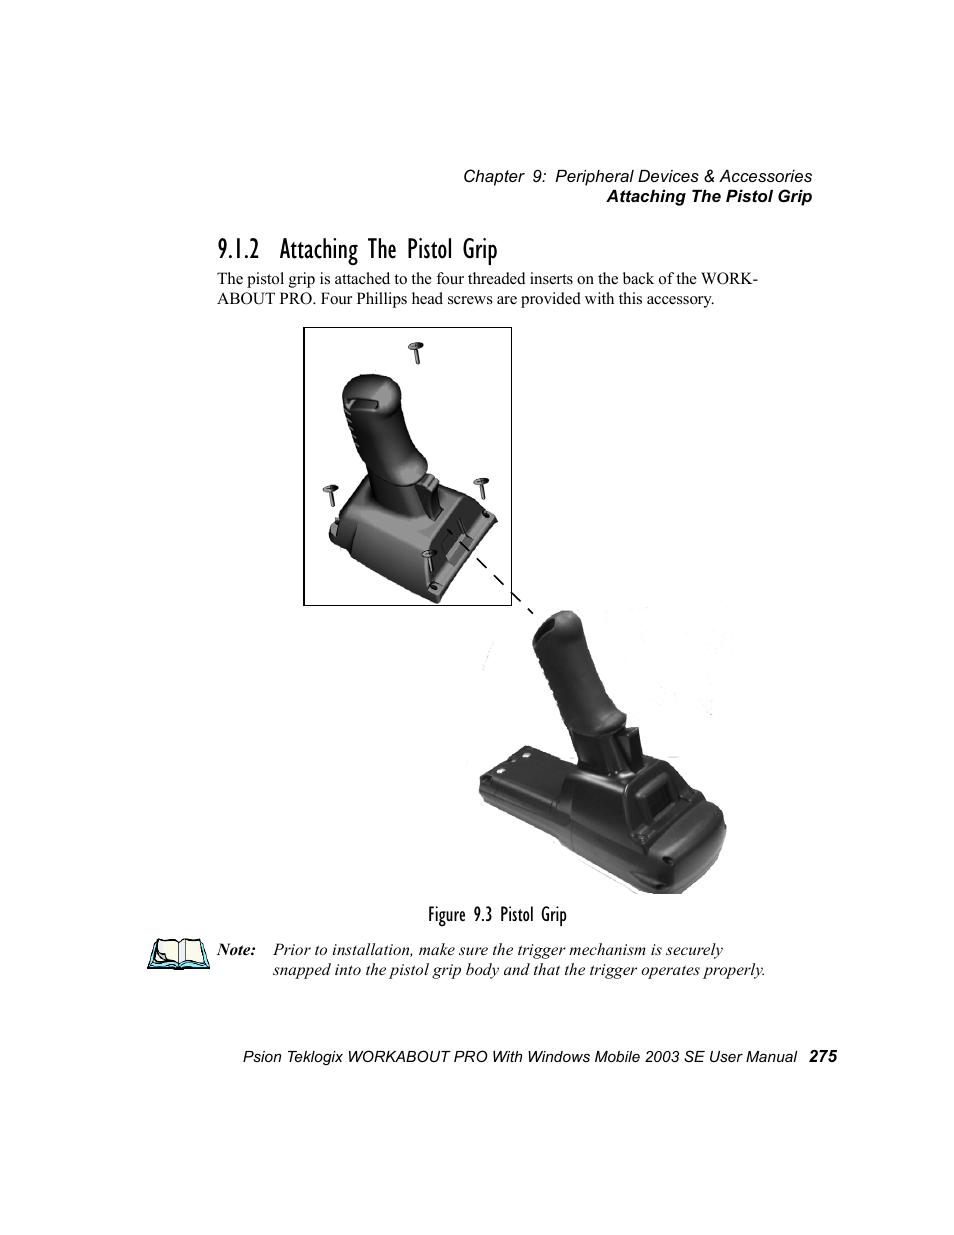 2 Attaching The Pistol Grip